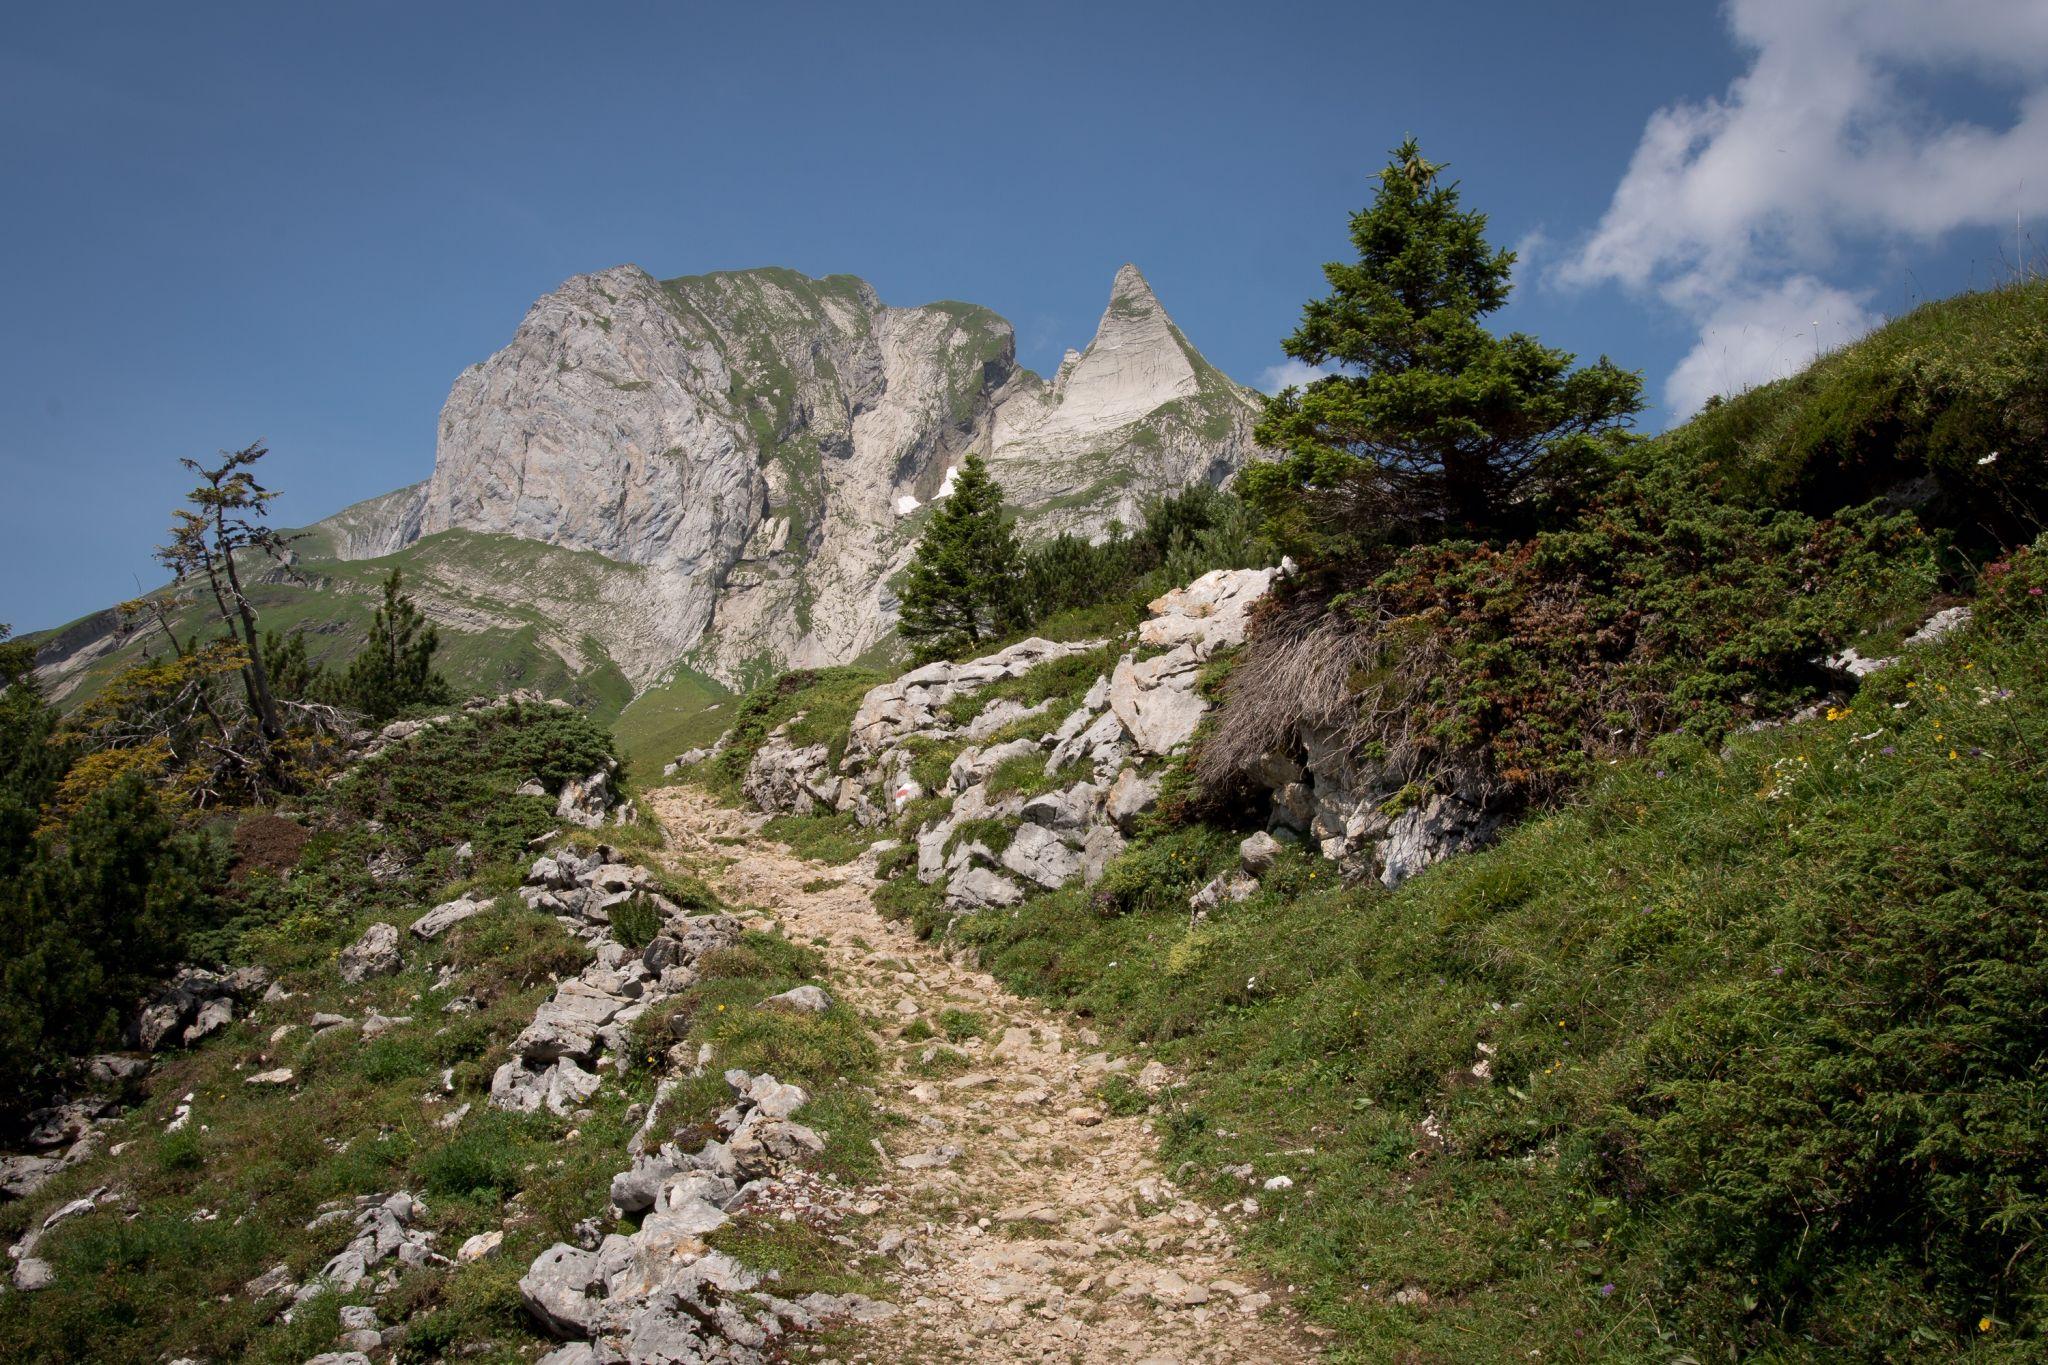 Girenspitz (Toblerone), Switzerland